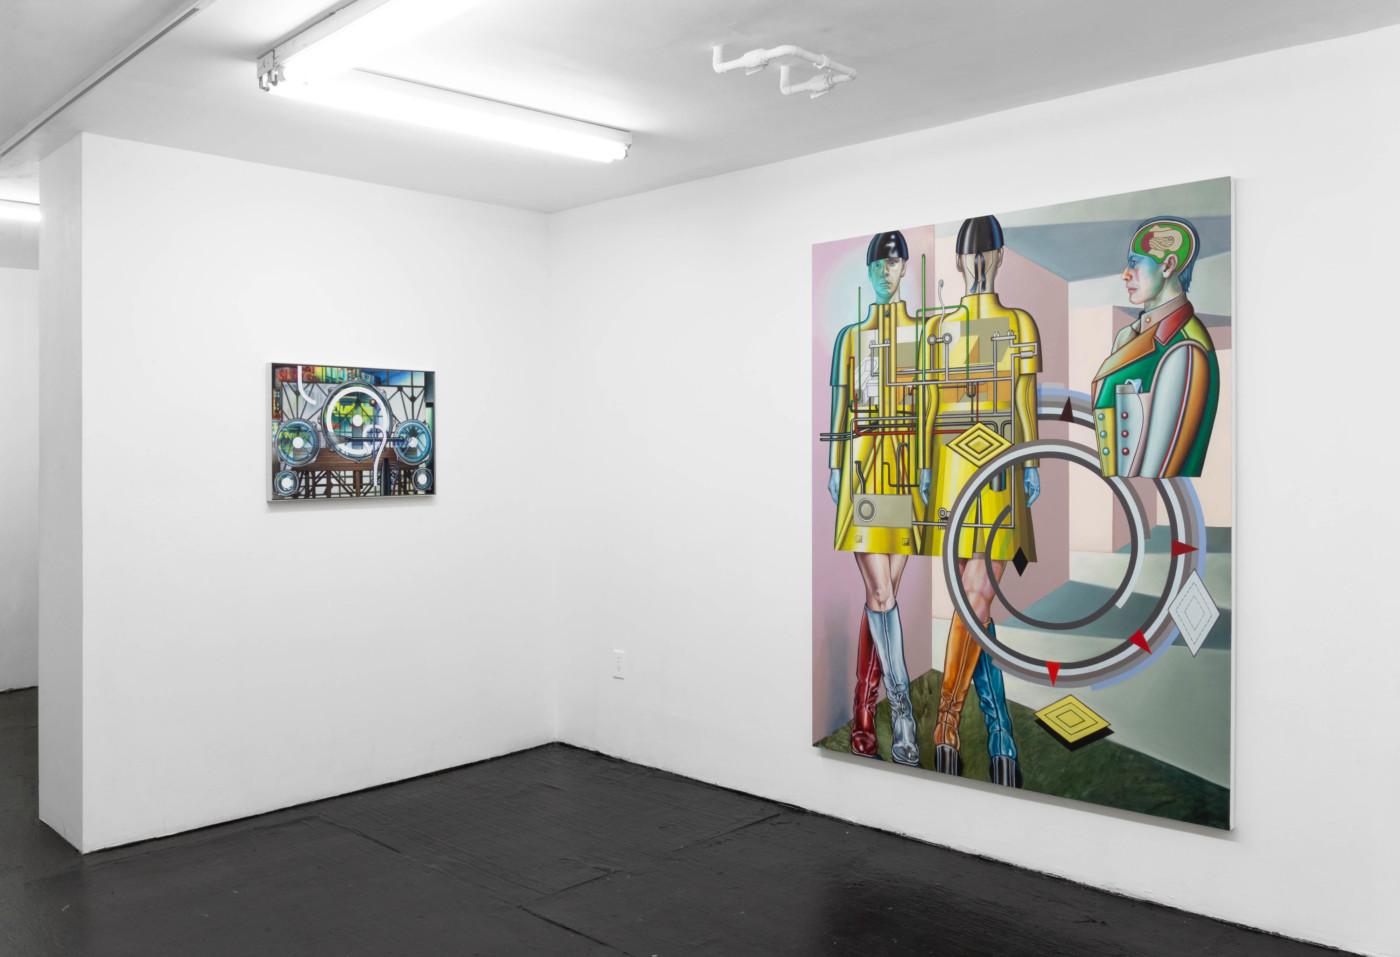 ORION MARTIN  Pressure Head,  2021, Bodega, New York, USA, installation view - High Art Gallery Paris